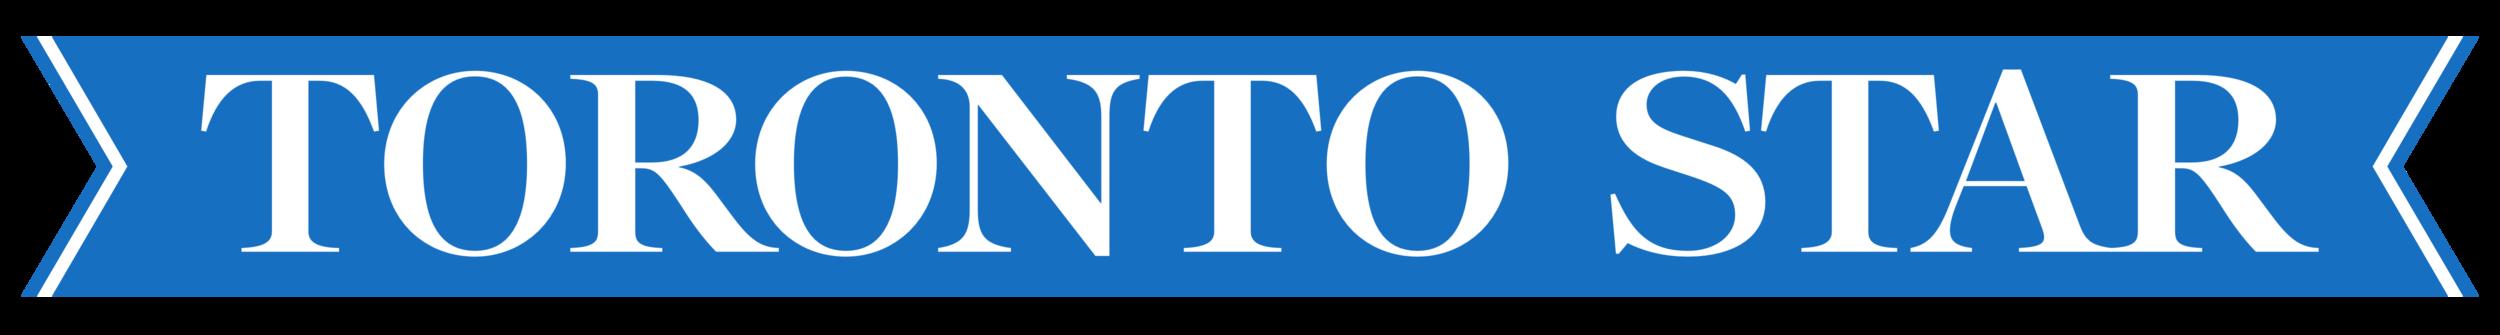 the_toronto_star_logo_logotype_copy1.png